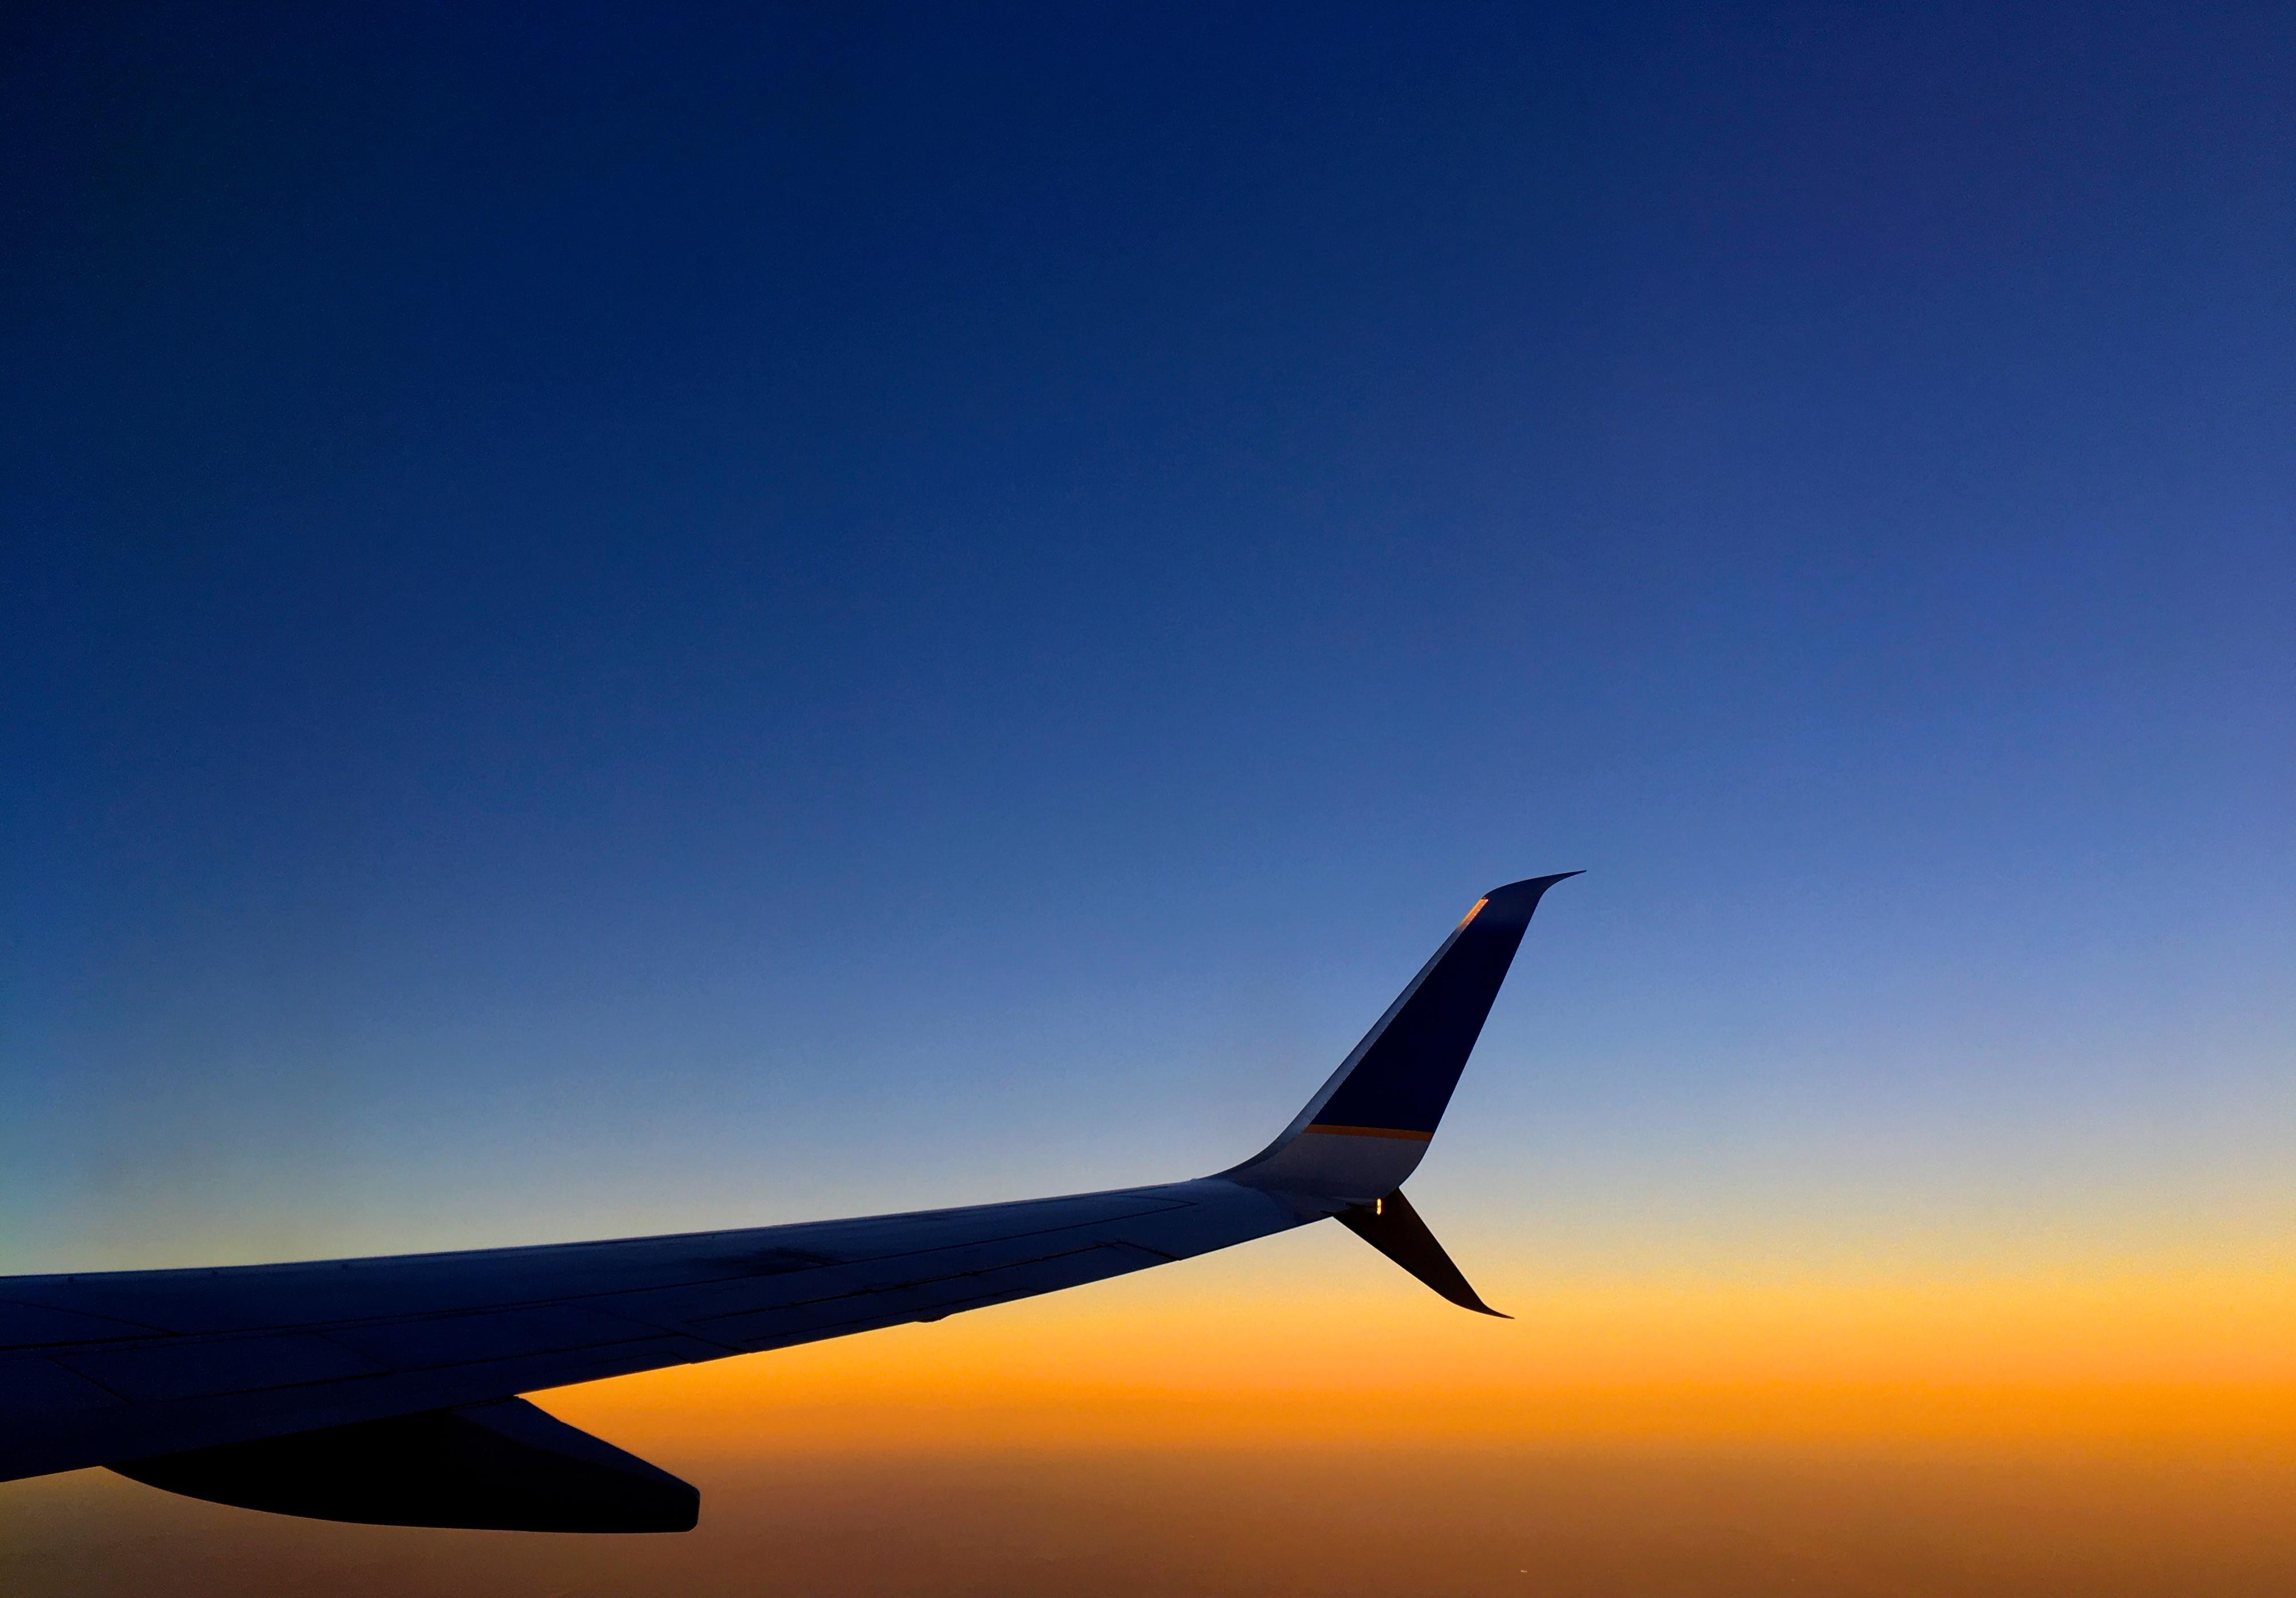 Gambar Horison Sayap Langit Matahari Terbenam Pesawat Terbang